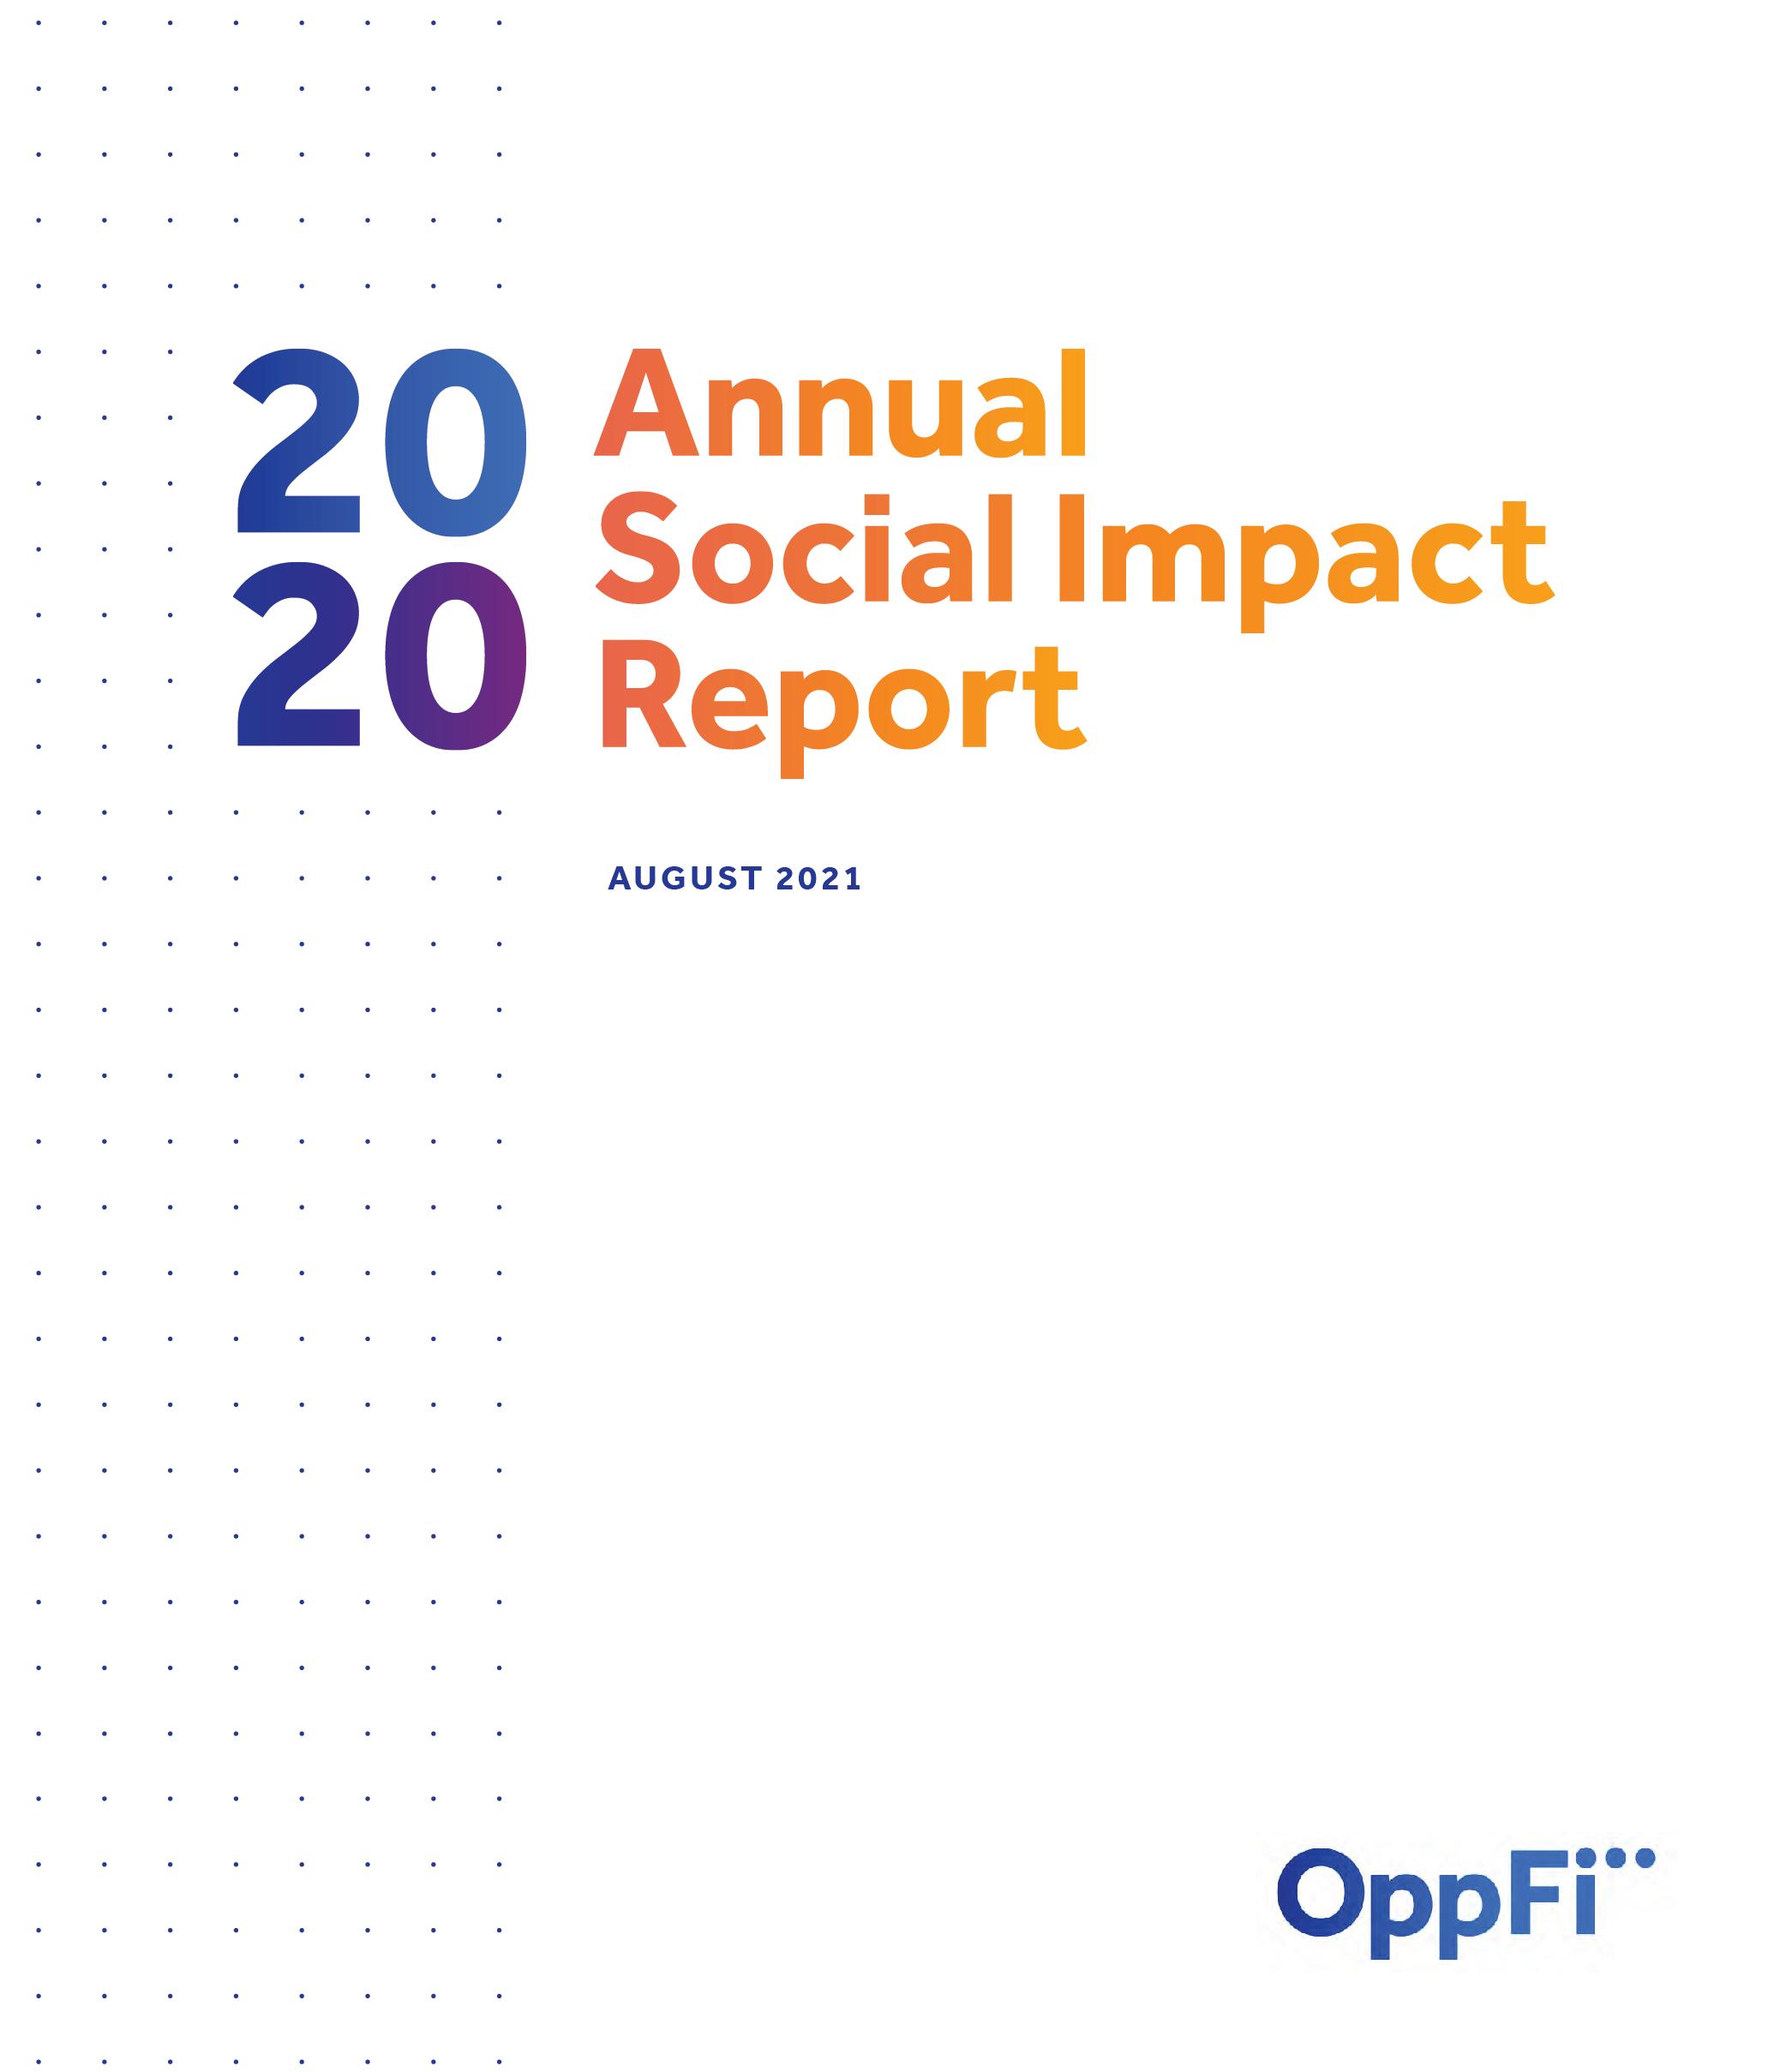 Social Impact Report cover